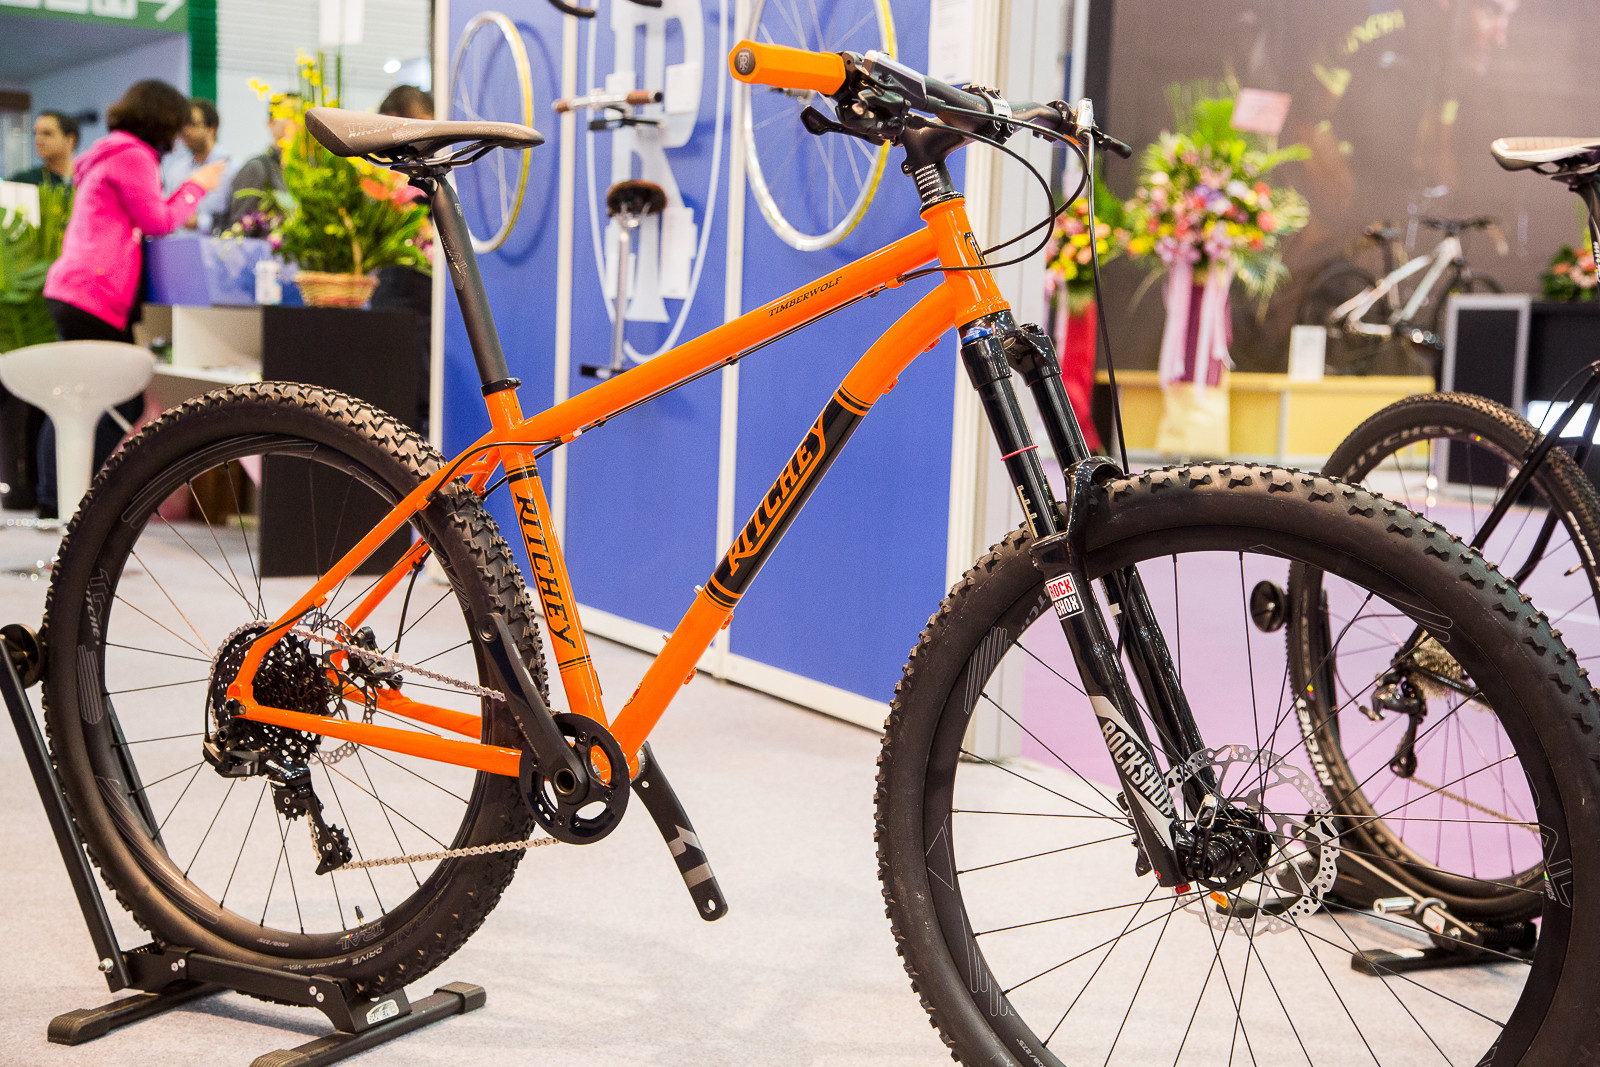 Ritchey 27.5+ Hardtail - 2016 Taipei Bike Show - Mountain Biking Pictures - Vital MTB